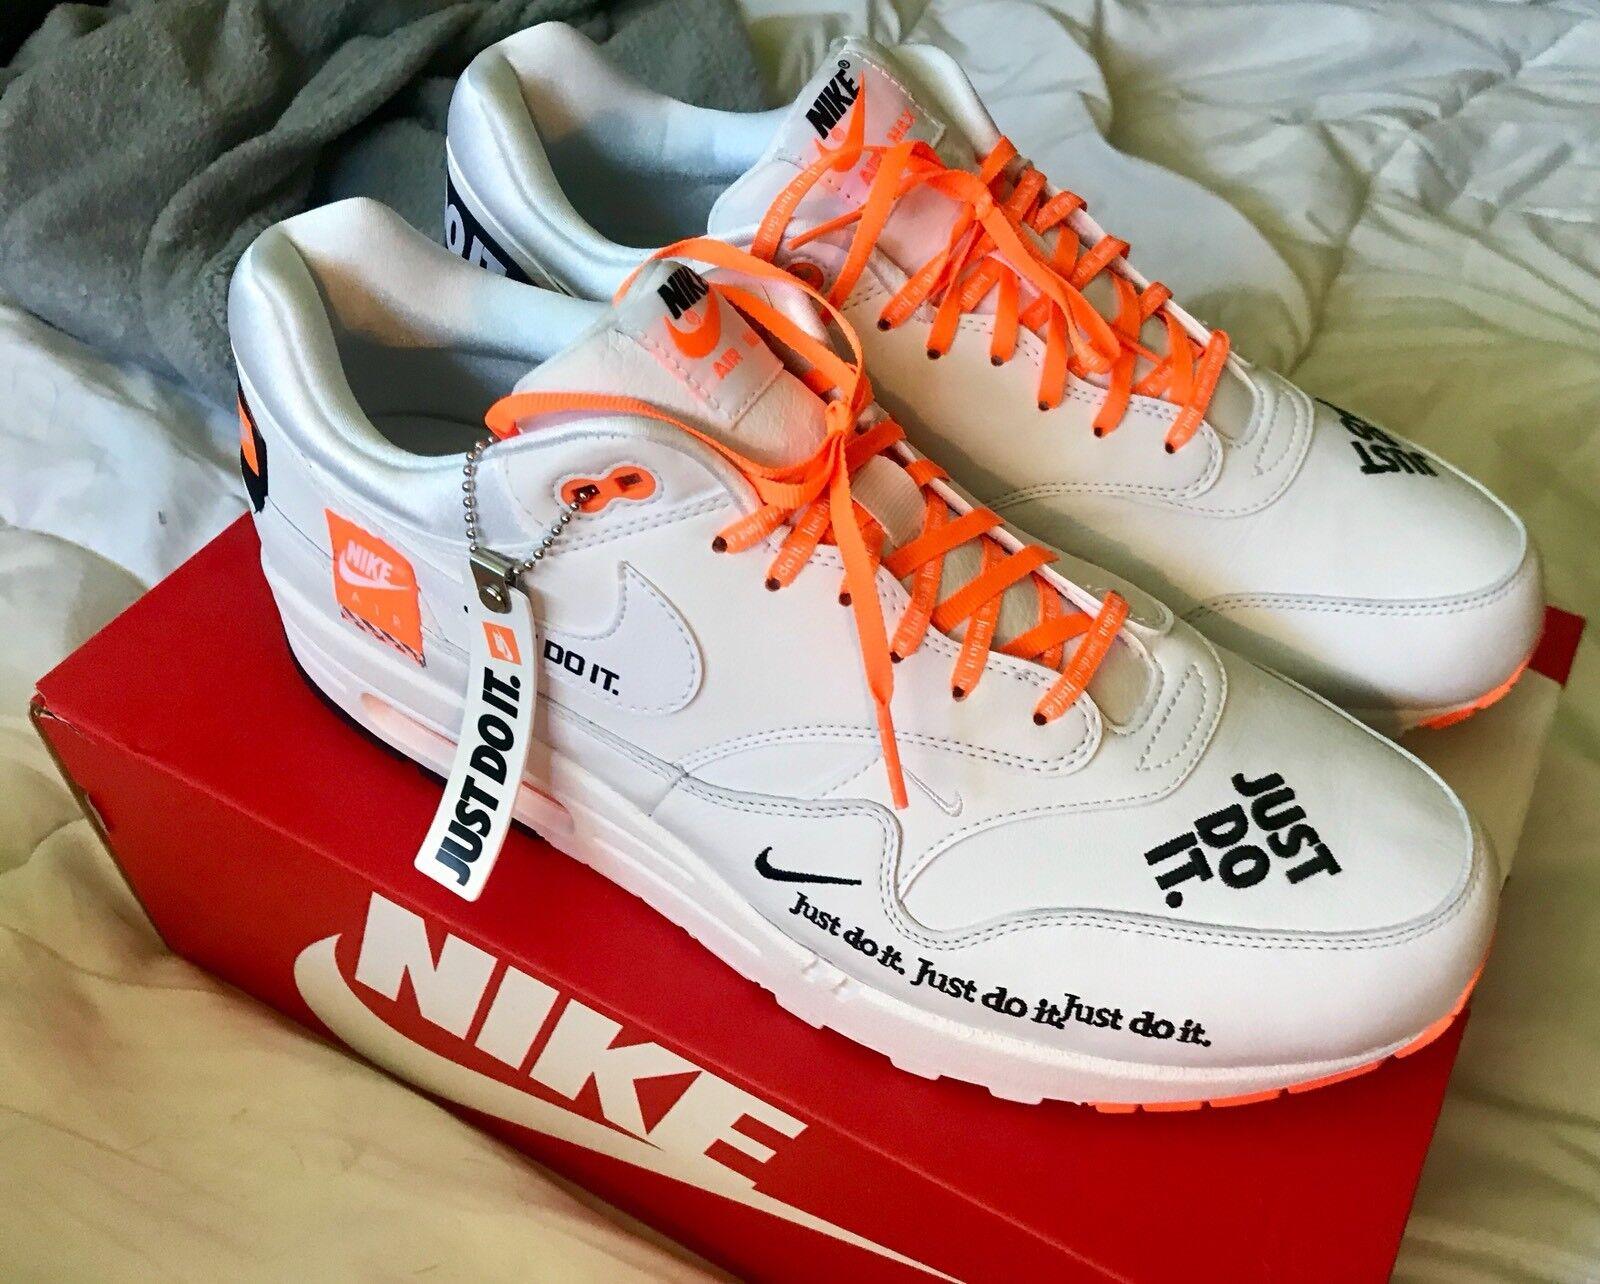 Nike Air Max 1 Just Do It White Orange Sz 13 AO1021-100